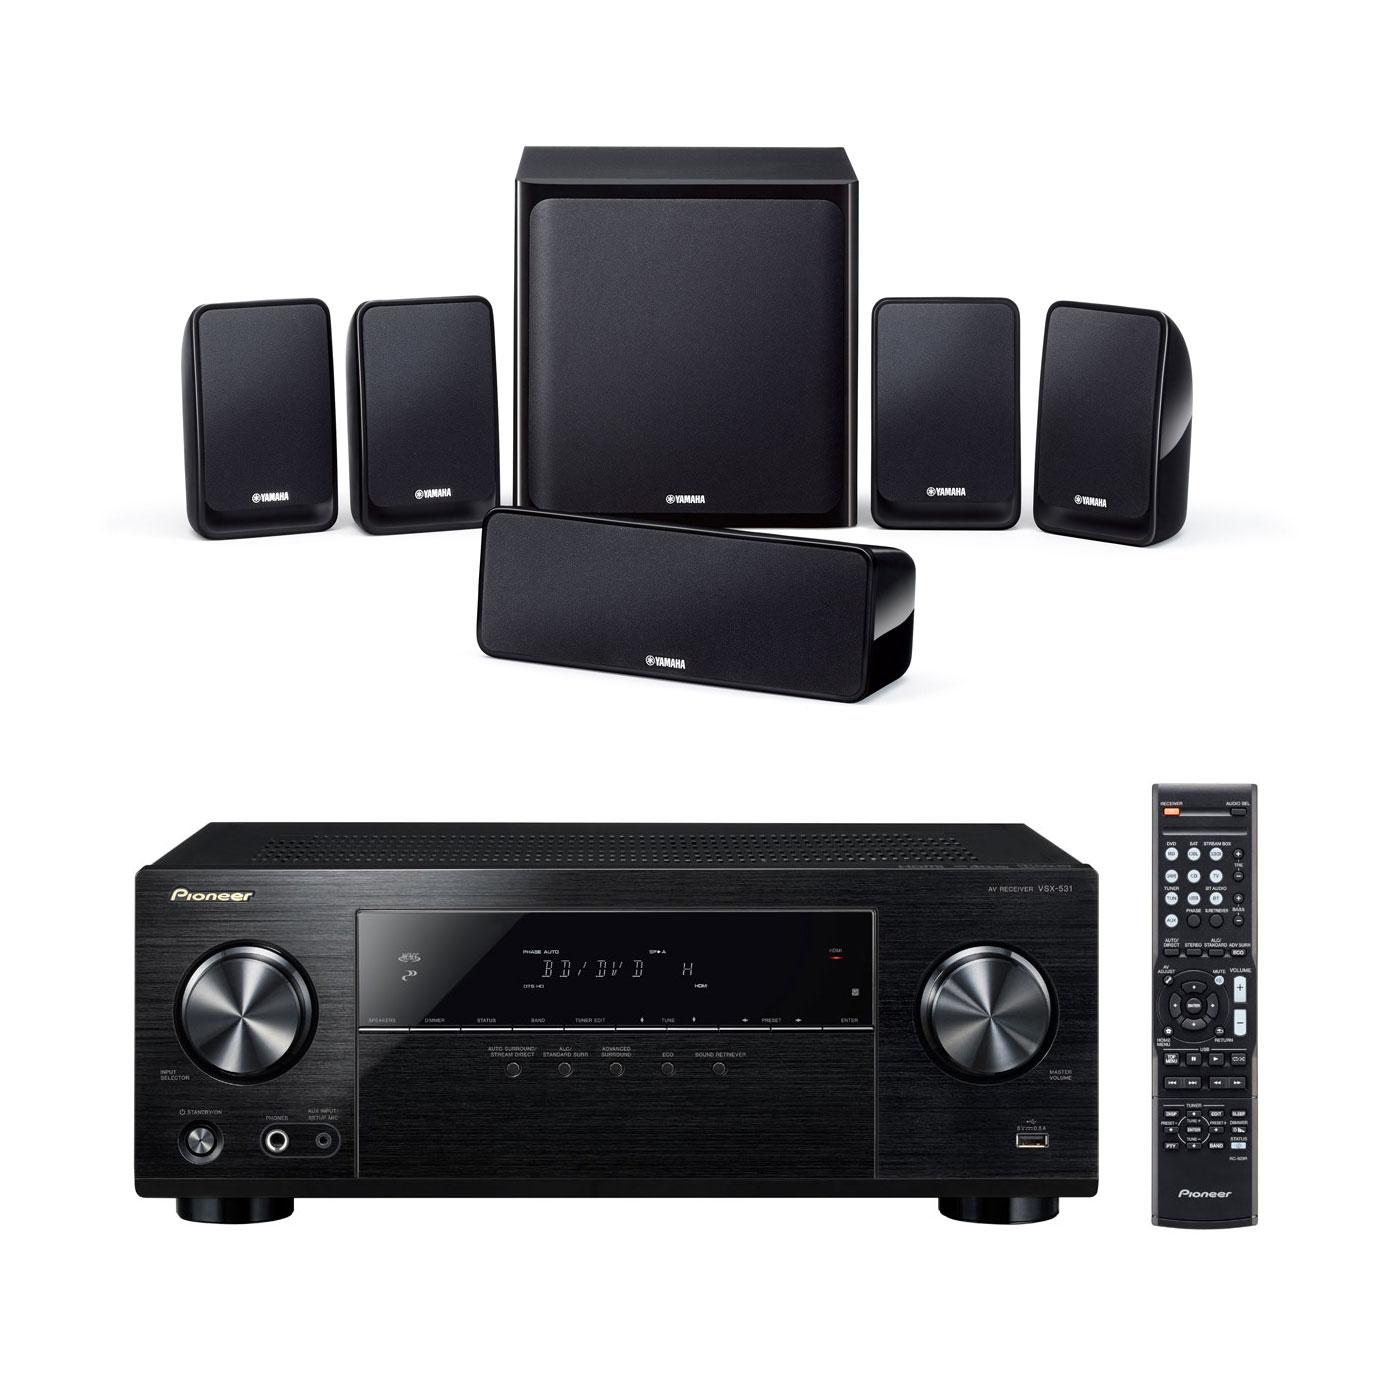 Ensemble home cinéma Pioneer VSX-531B + Yamaha NS-P20 Ampli-tuner Home Cinéma 5.1 Bluetooth, HDCP 2.2, et Upscaling Ultra HD 4K avec 4 entrées HDMI + Pack d'enceintes 5.1